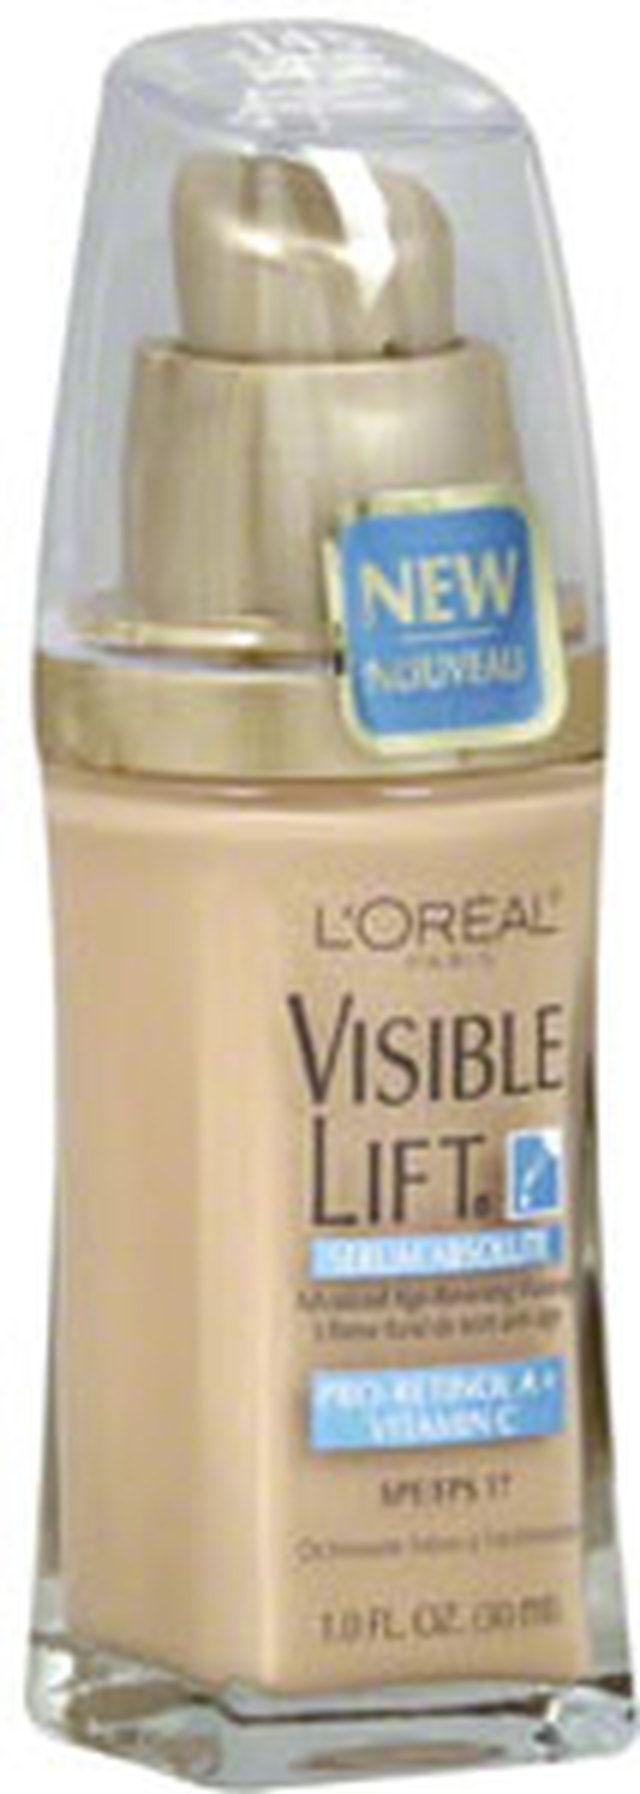 Best drugstore makeup for women over 50 printable